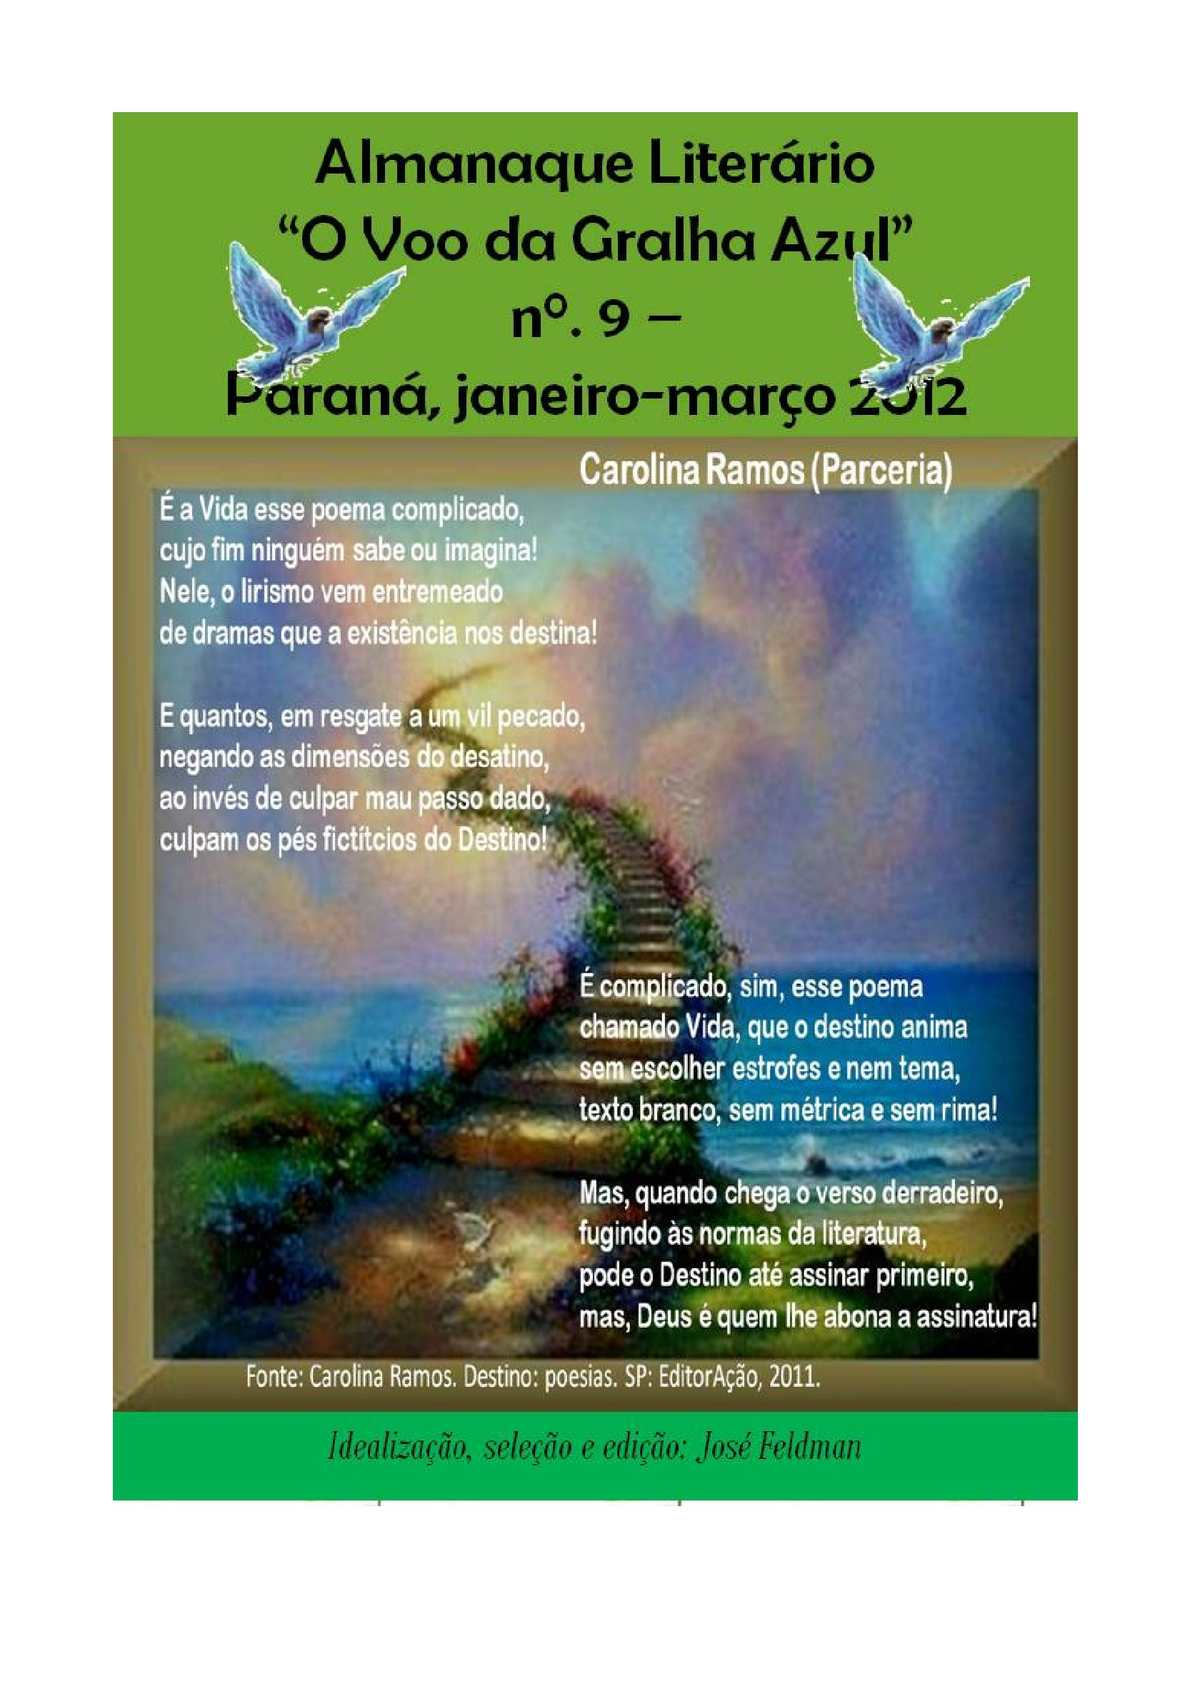 Calaméo - ALMANAQUE O VÔO DA GRALHA AZUL Nº9 Editor  José Feldman - Pr a081536ef39